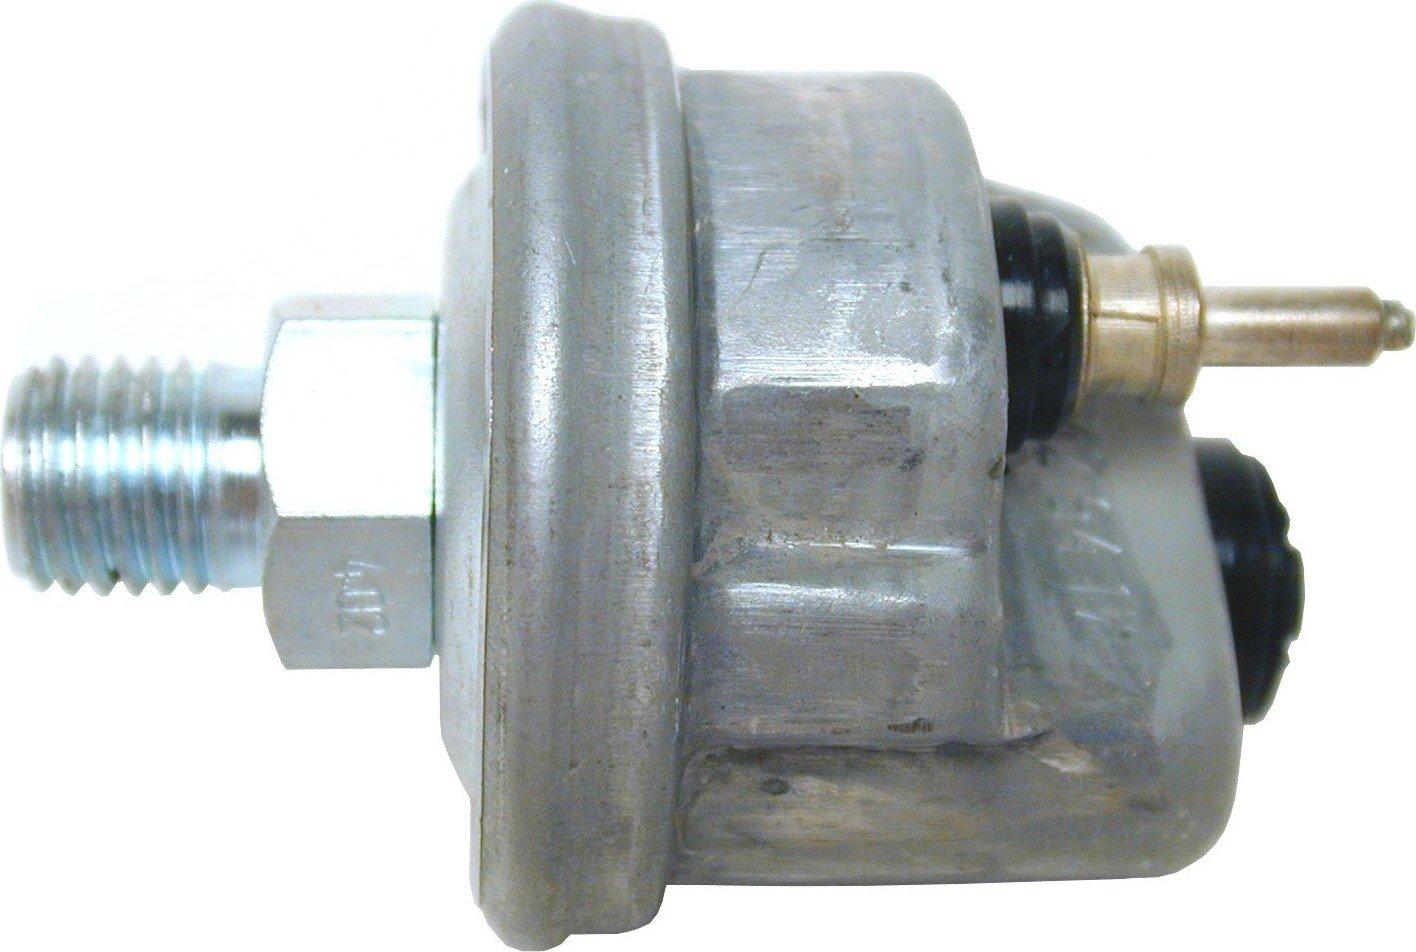 URO Parts 006 542 9417 At Oil filter Housing Oil Pressure Sender